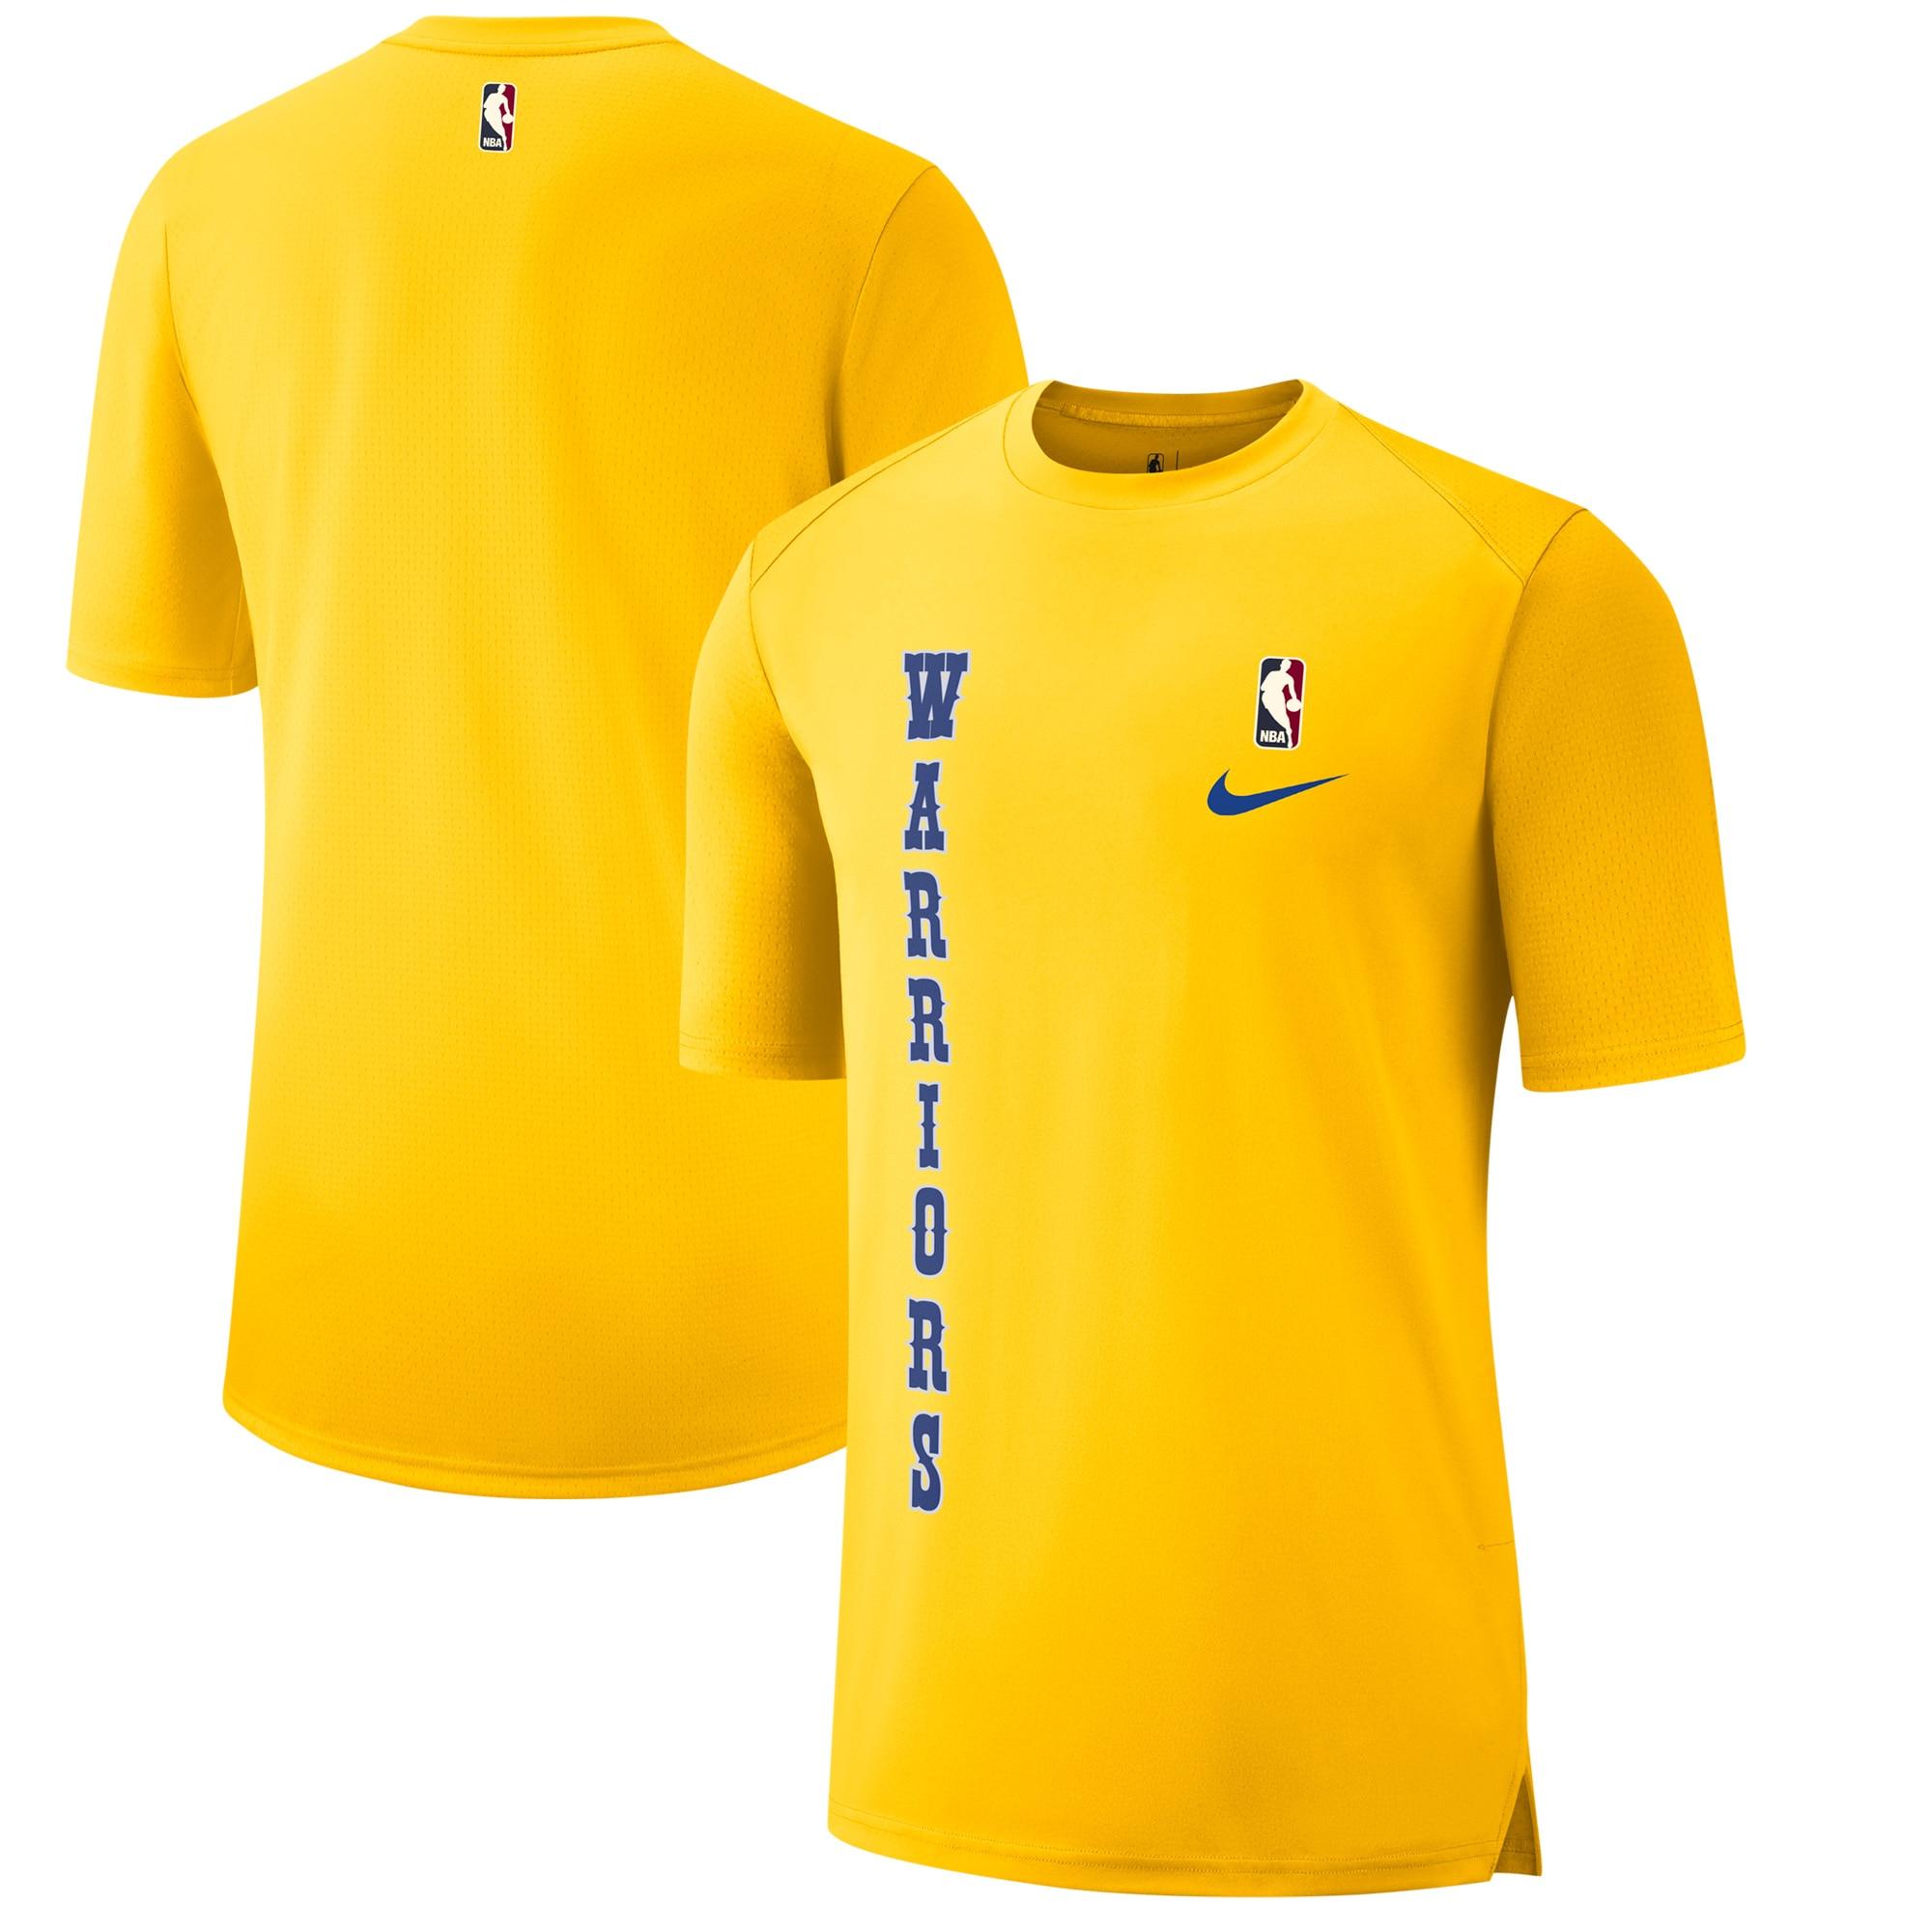 Golden State Warriors Nike Hardwood Classics Hyper Elite Shooting T-Shirt - Gold